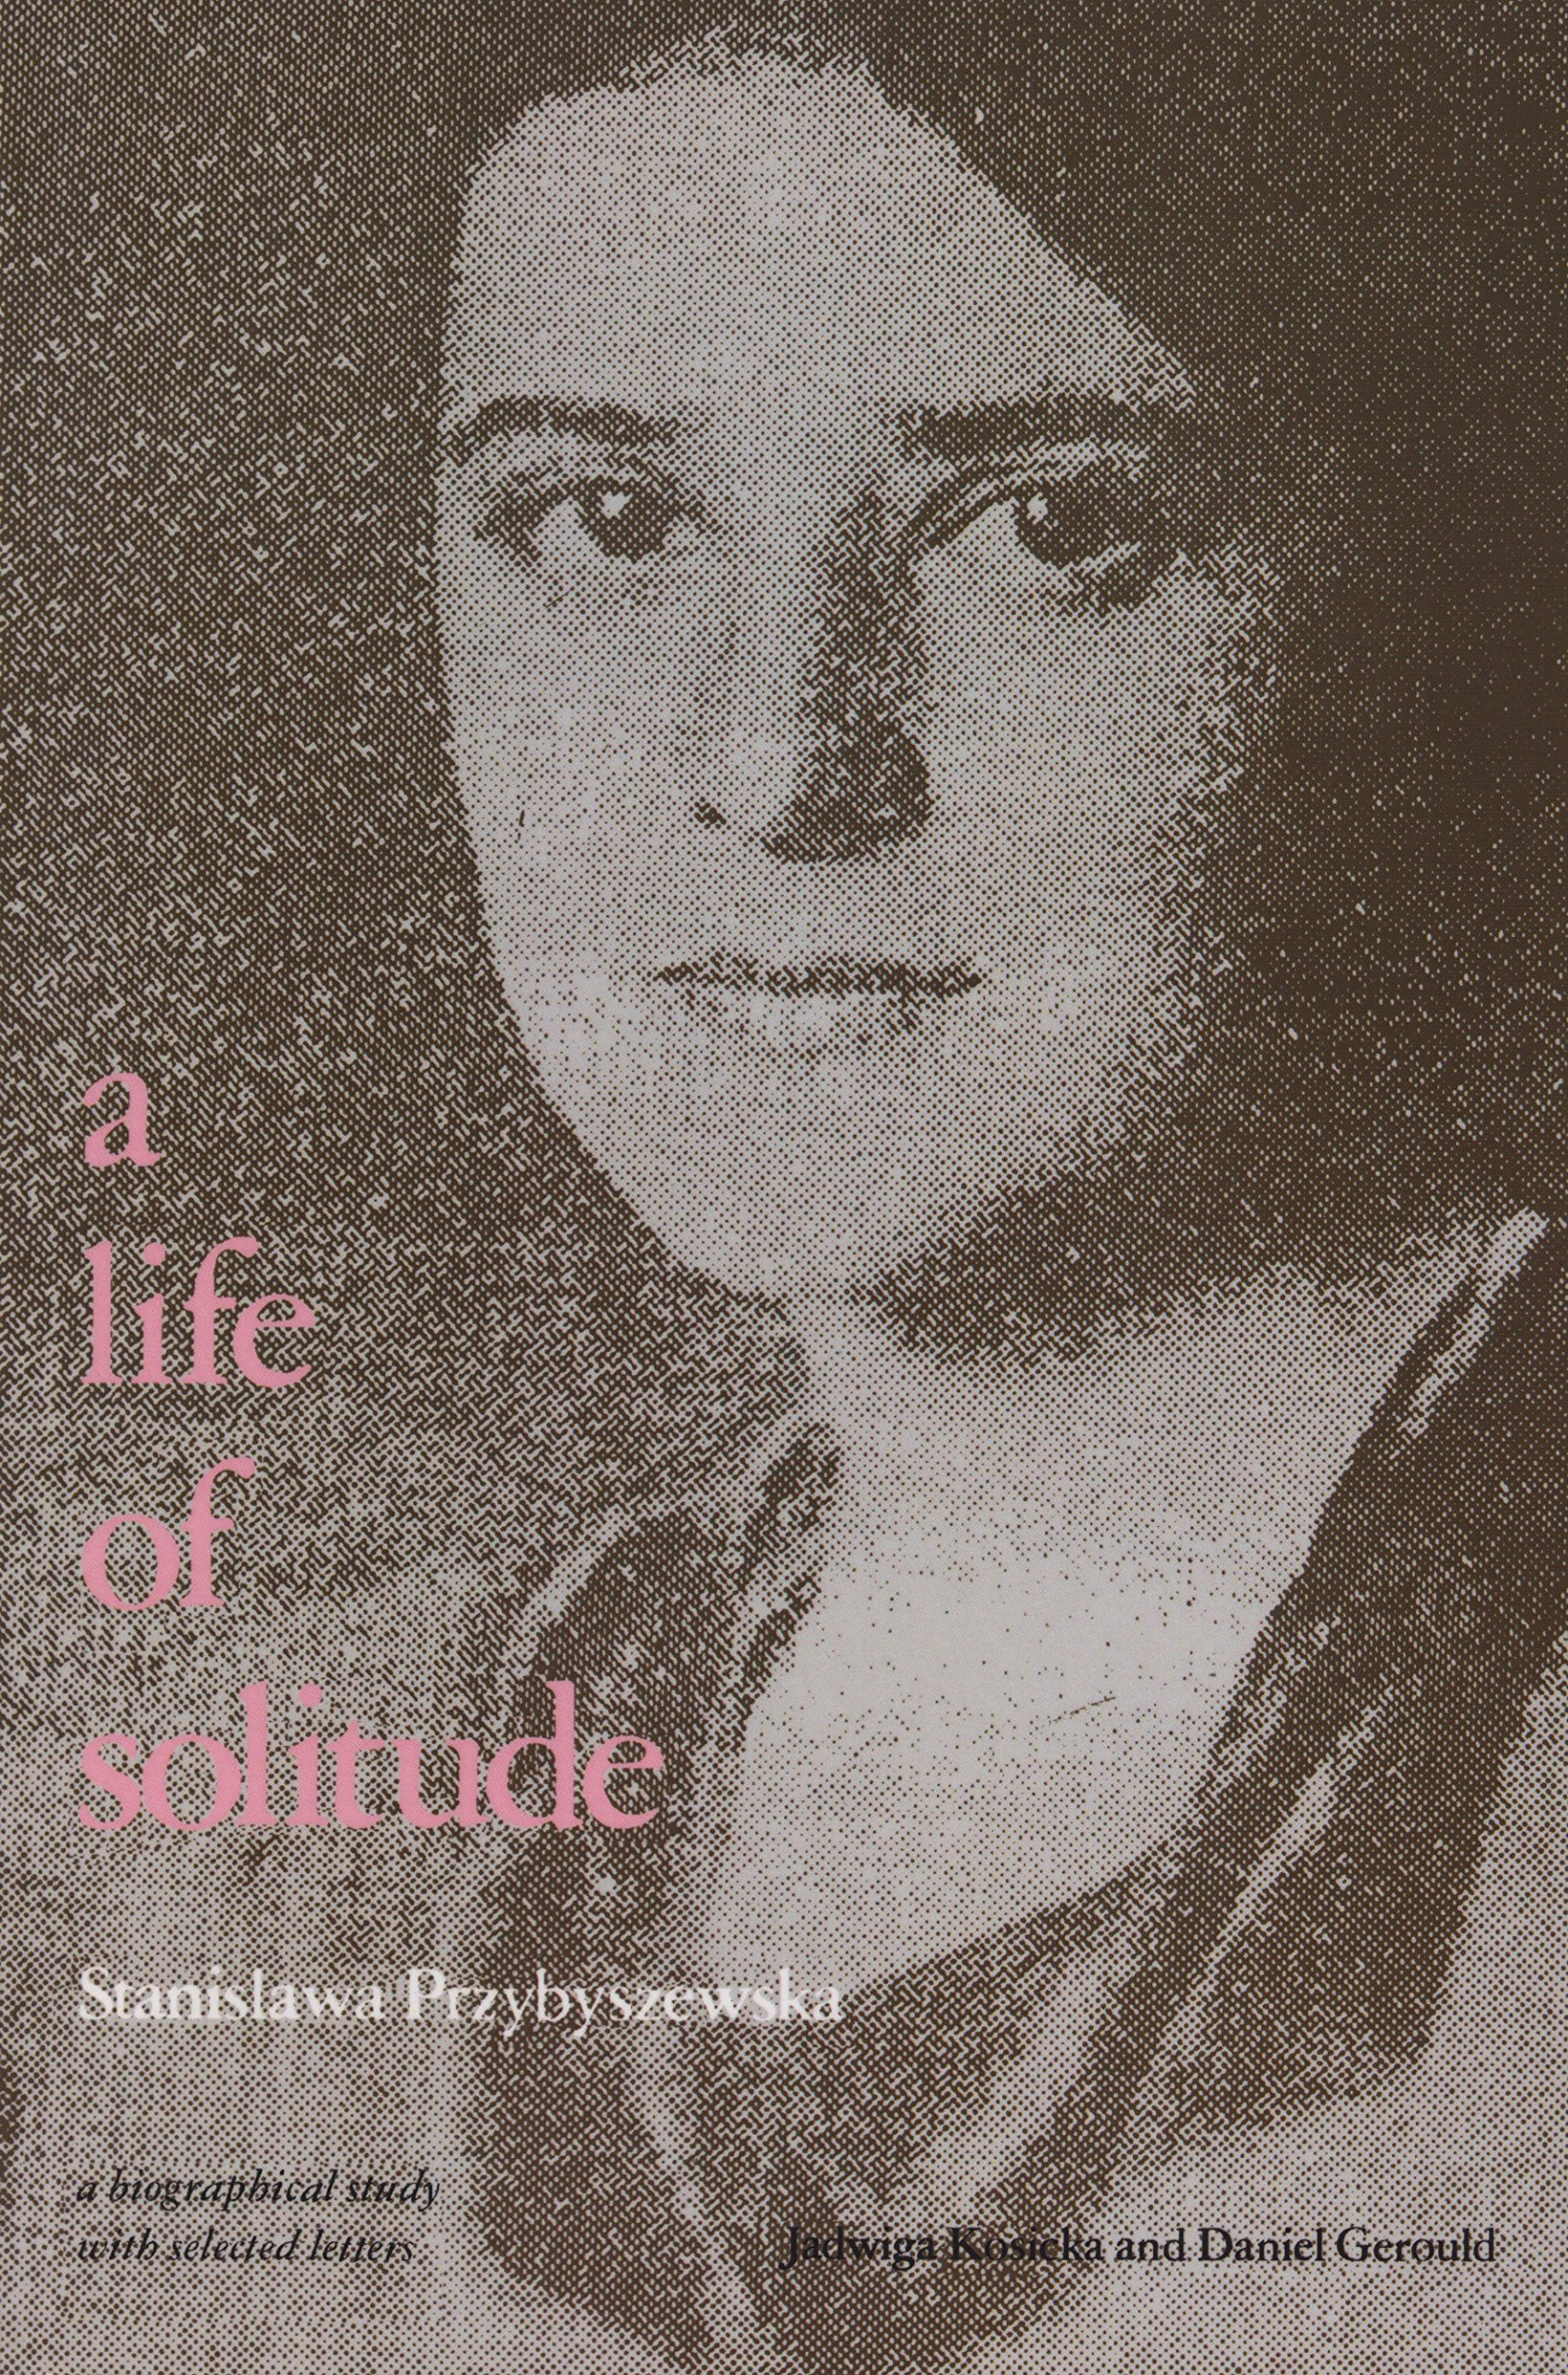 Slikovni rezultat za Daniel Gerould, A Life of Solitude: Stanislawa  Przybyszewska, a Biographical Study with  Selected Letters